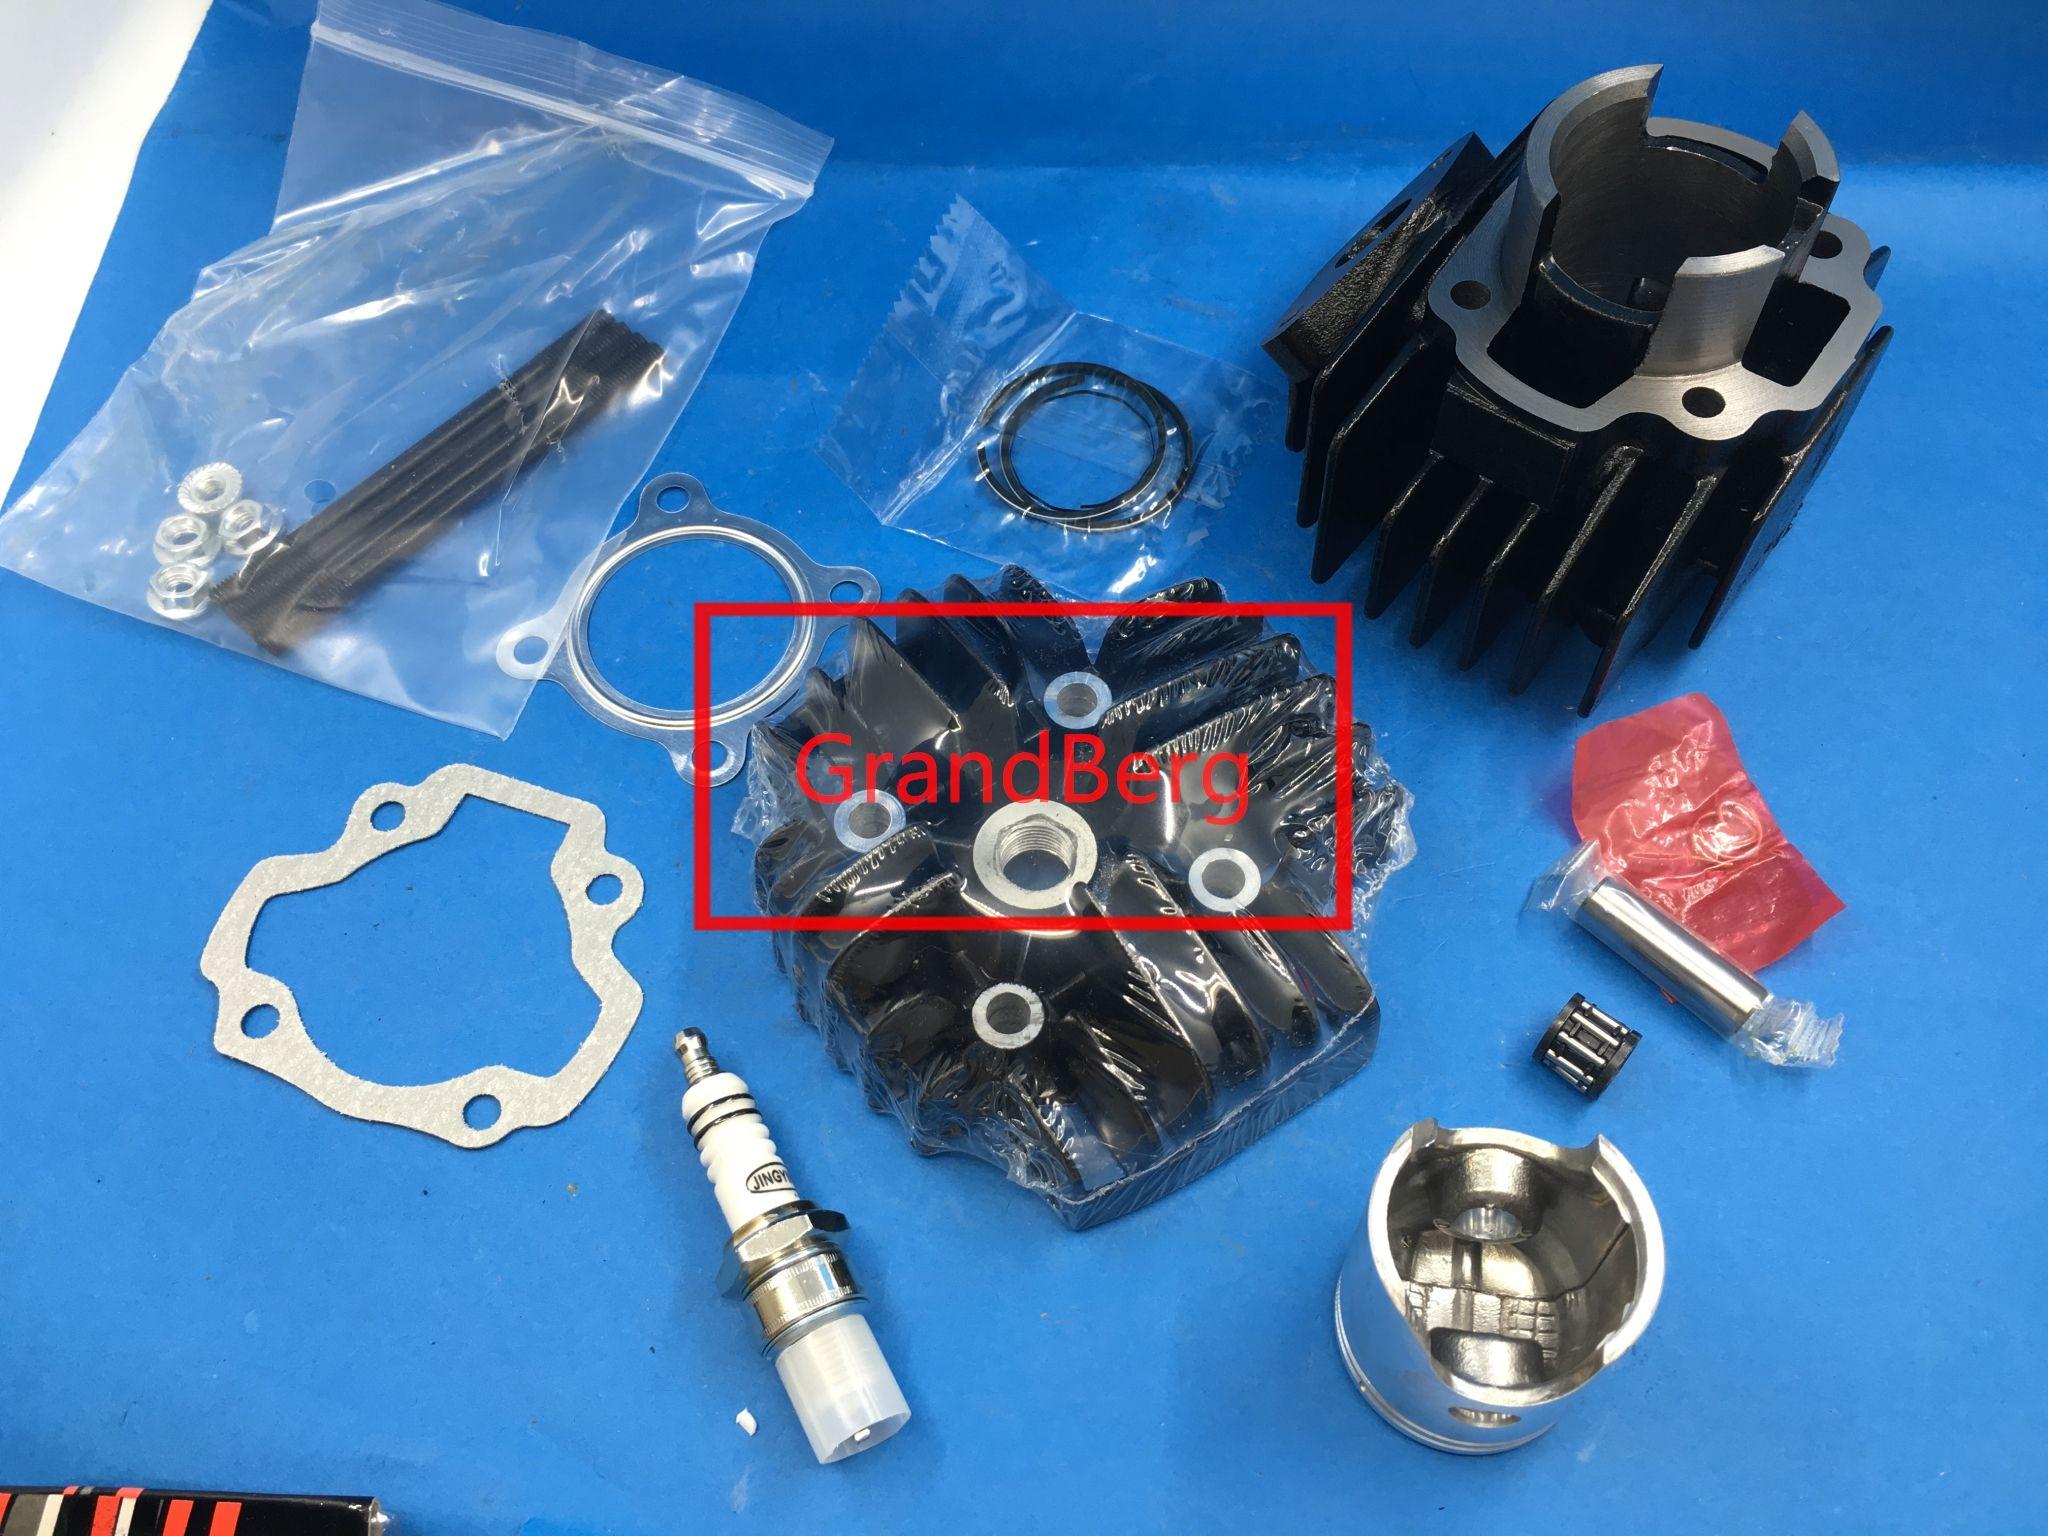 PW 50 PW50 QT50 CYLINDER HEAD PISTON GASKET KIT fit for YAMAHA PW50:  1981-2009 Q